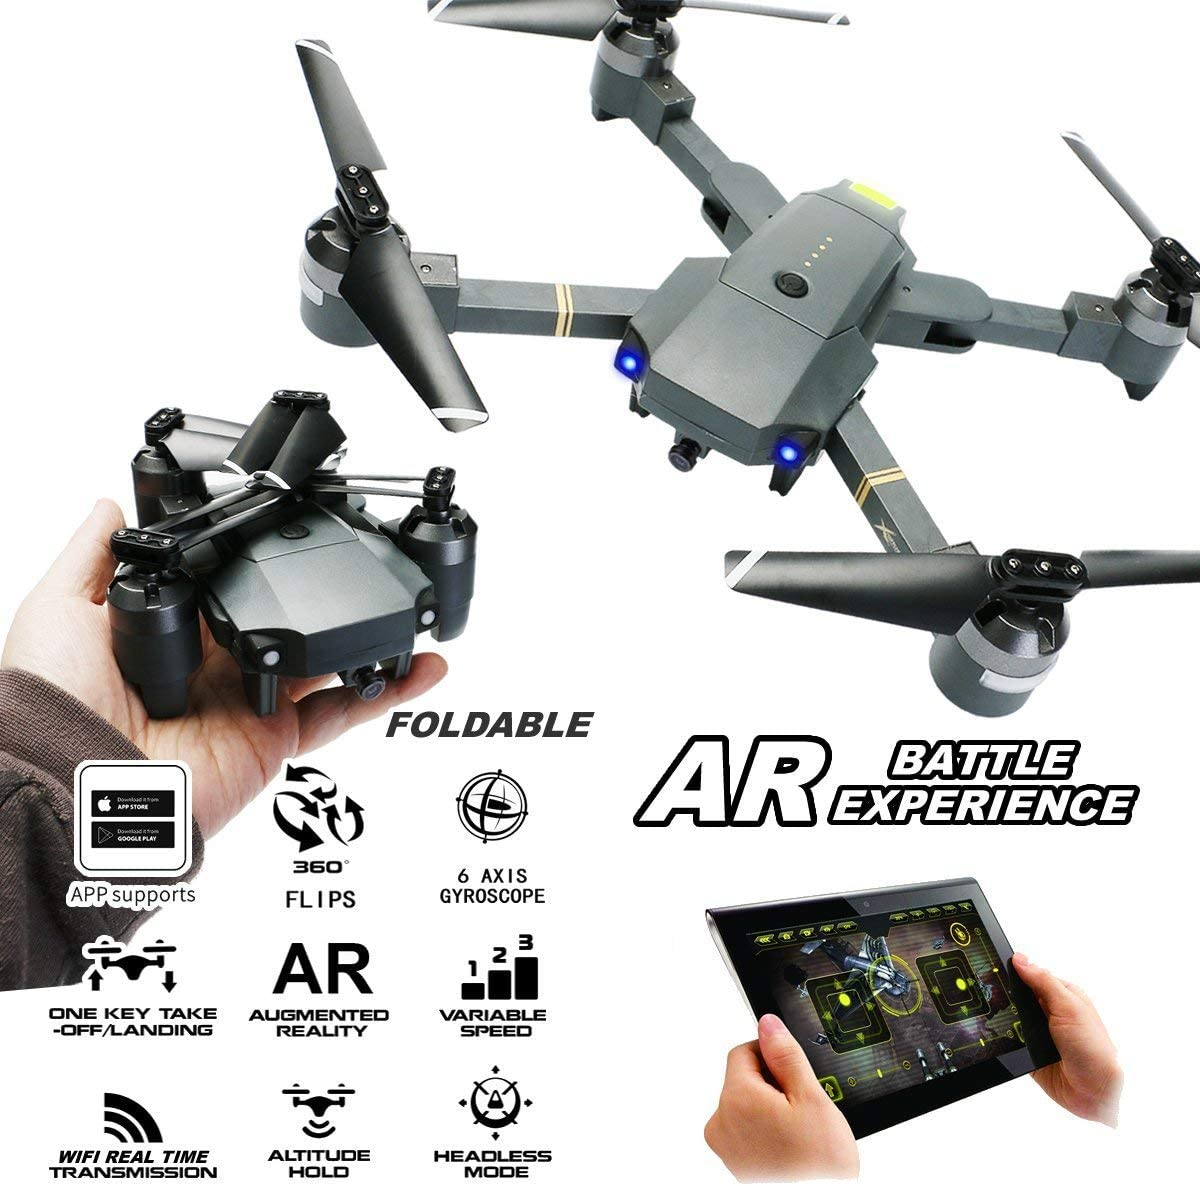 Xianxian88 RC Drone Gran Angular de posicionamiento de Flujo óptico Plegable con 1080P WiFi HD cámara Mapa de Disparo aéreo Quadcopter: Amazon.es: Hogar